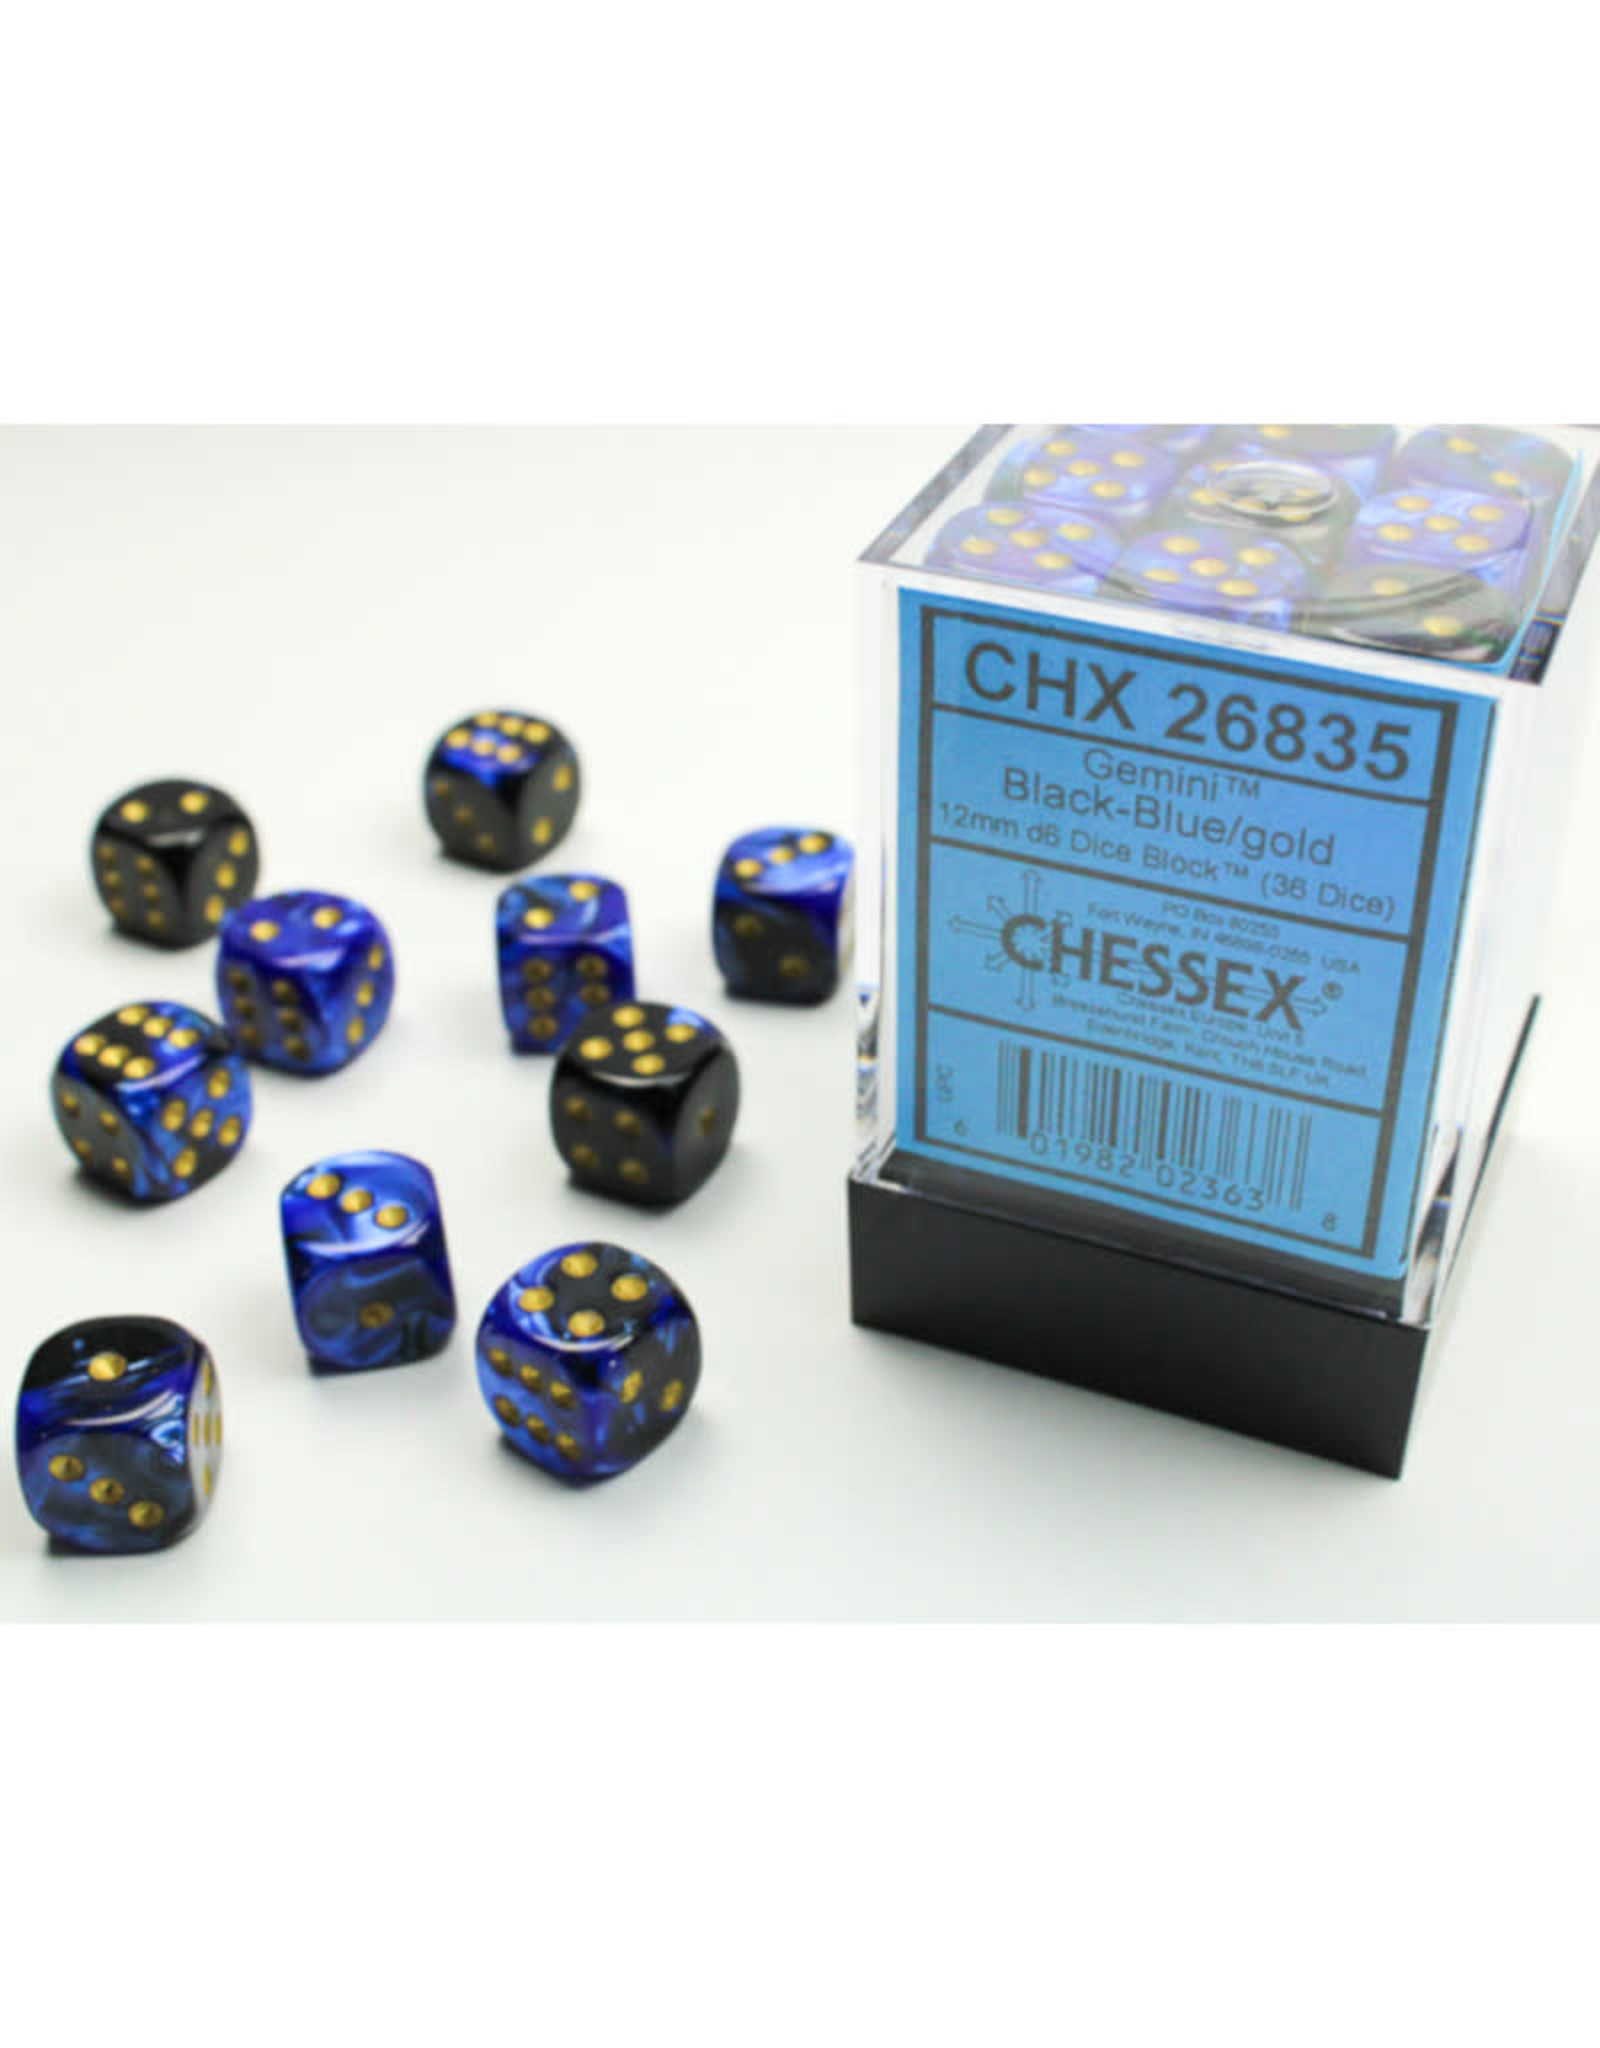 Chessex D6 Dice: 12mm Gemini Black/Blue (36)